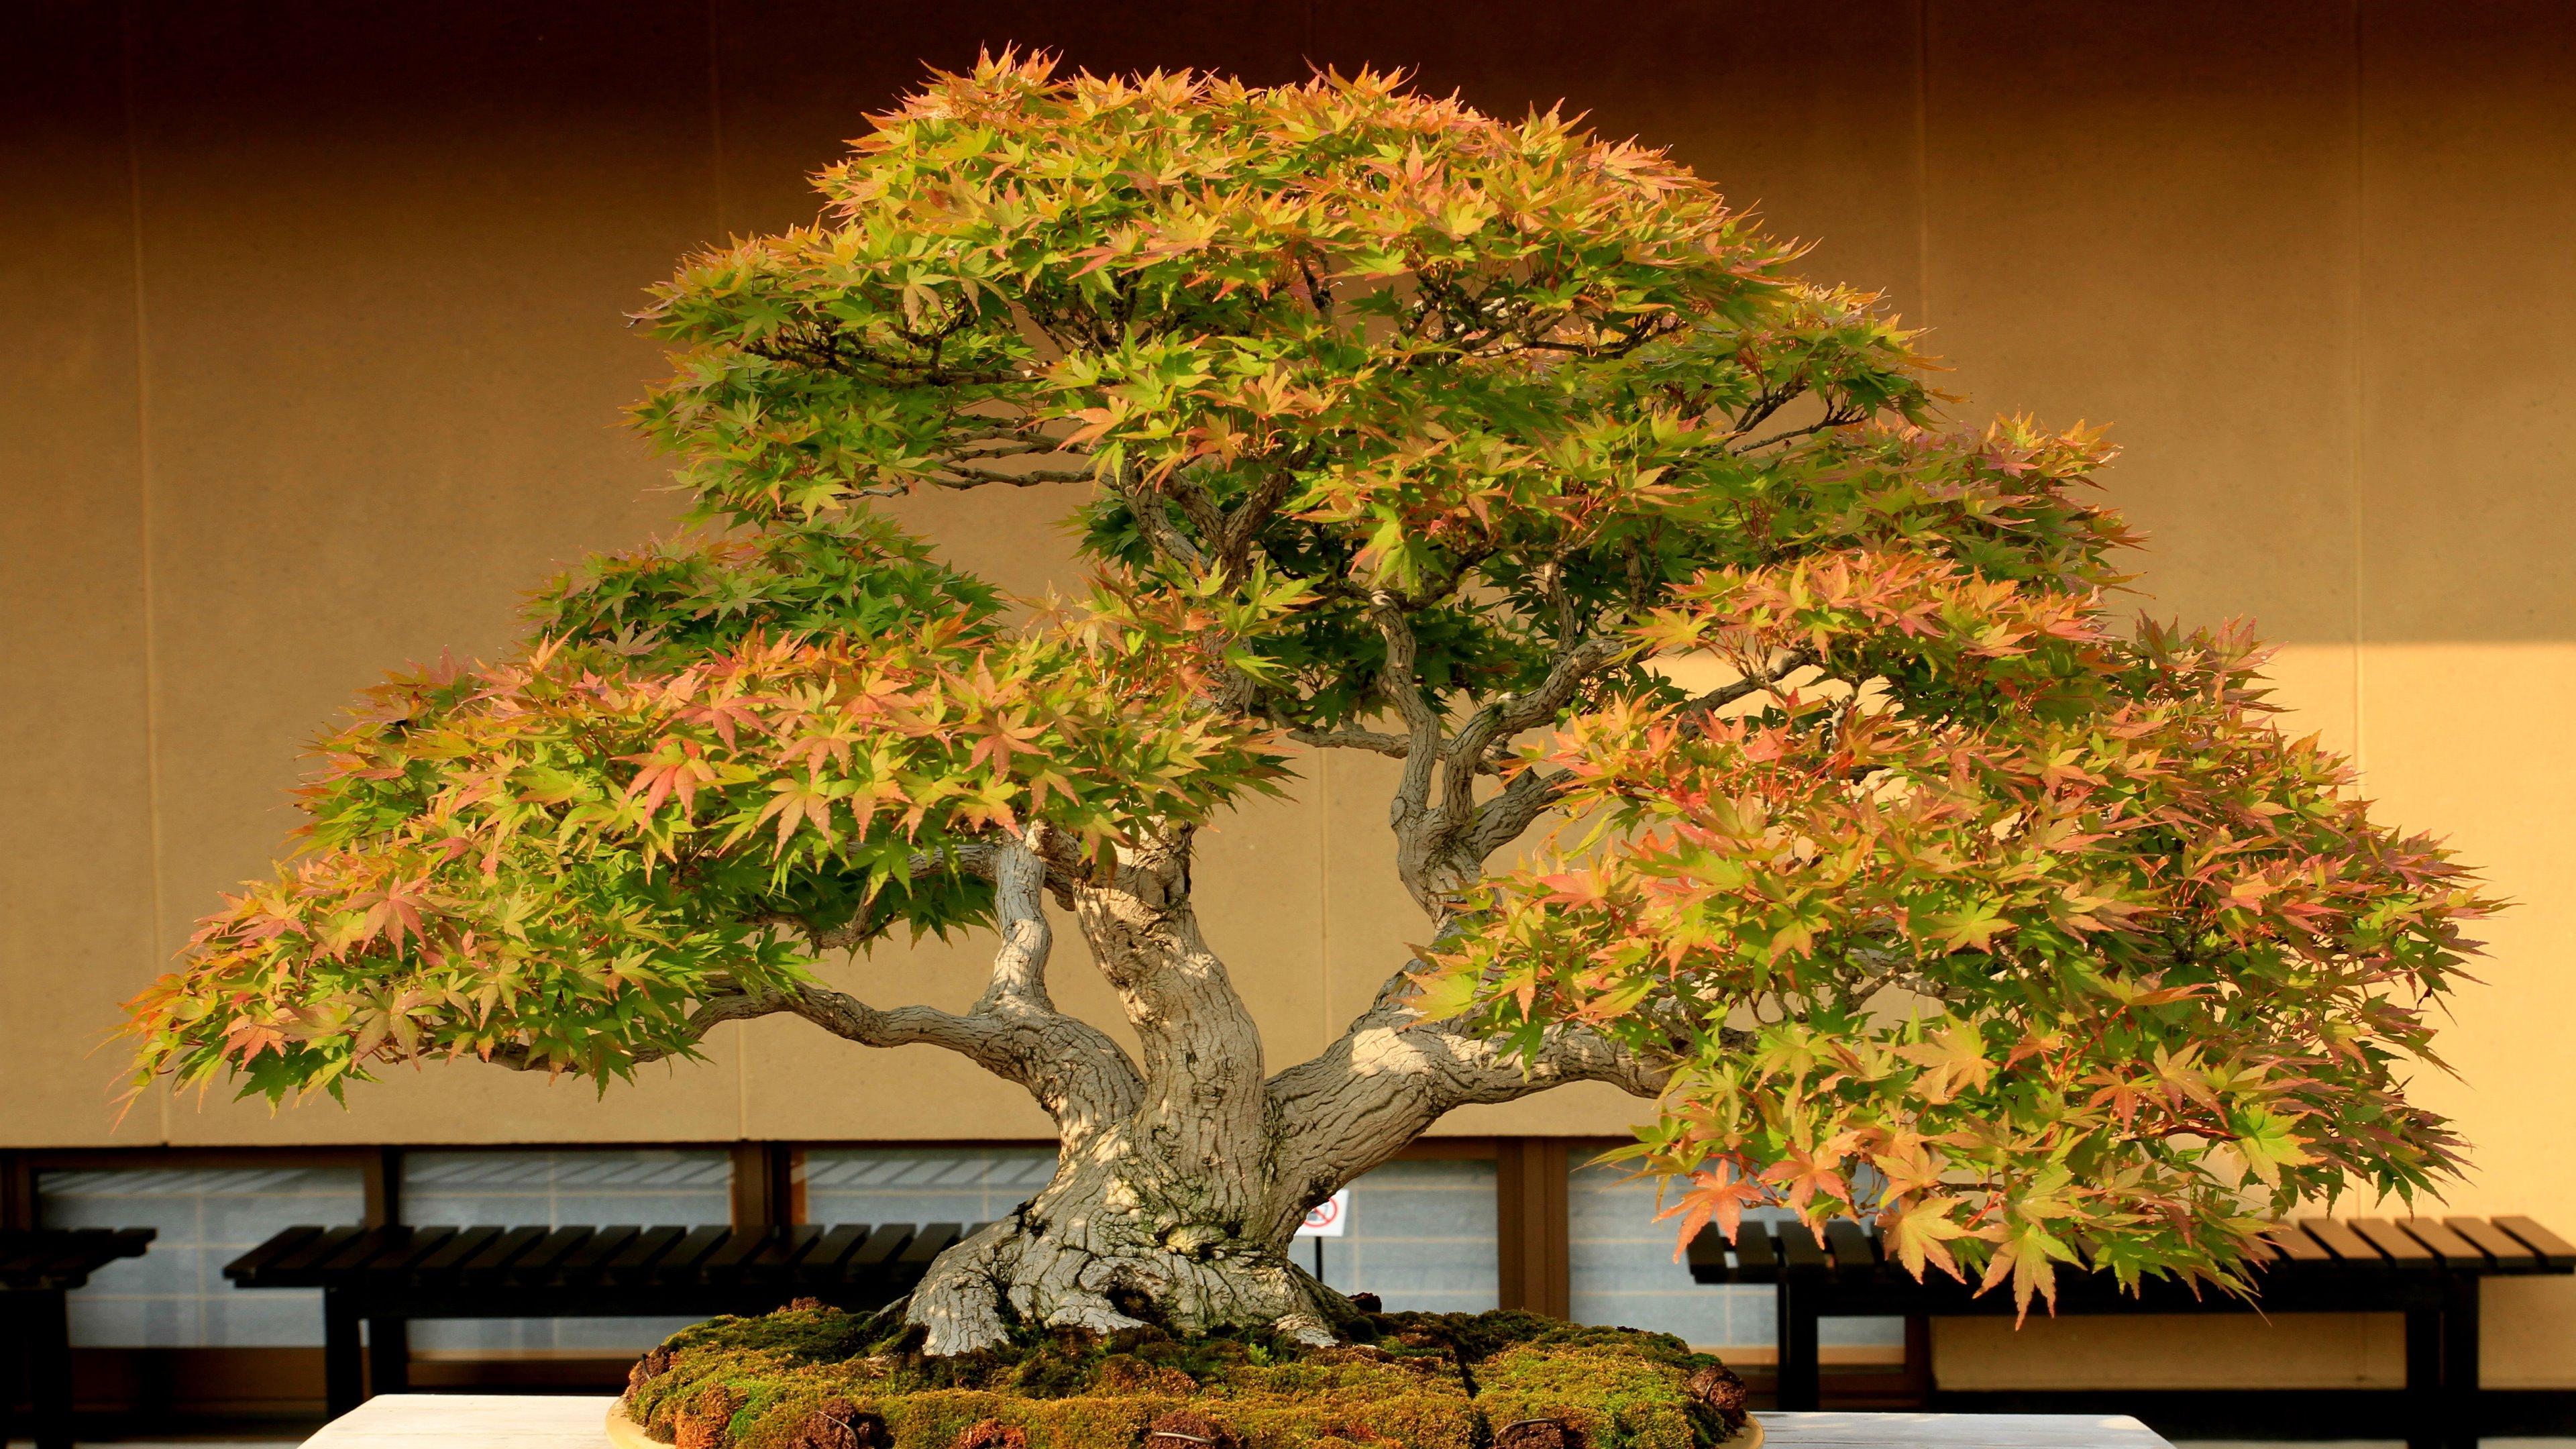 17 bonsai hd wallpapers backgrounds wallpaper abyss